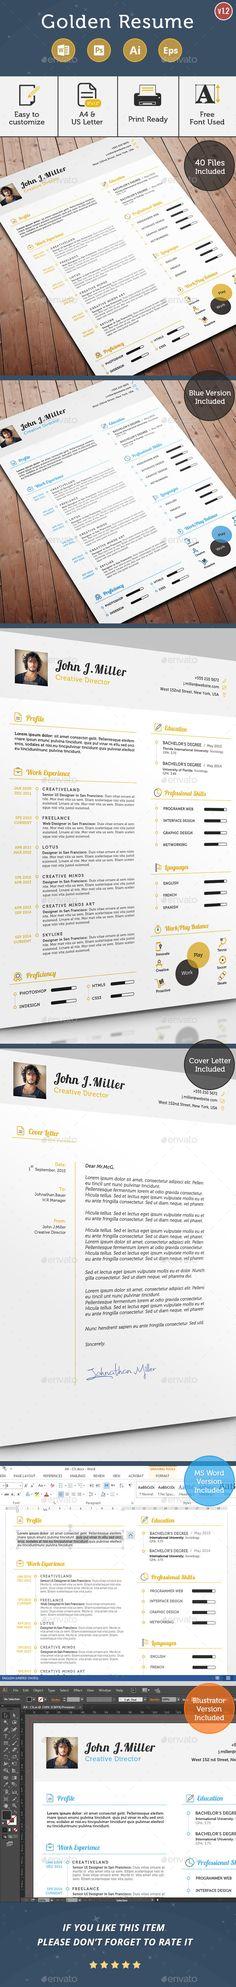 Corporate Lawyer CV Resume Template Cv resume template, Lawyer - killer resume template